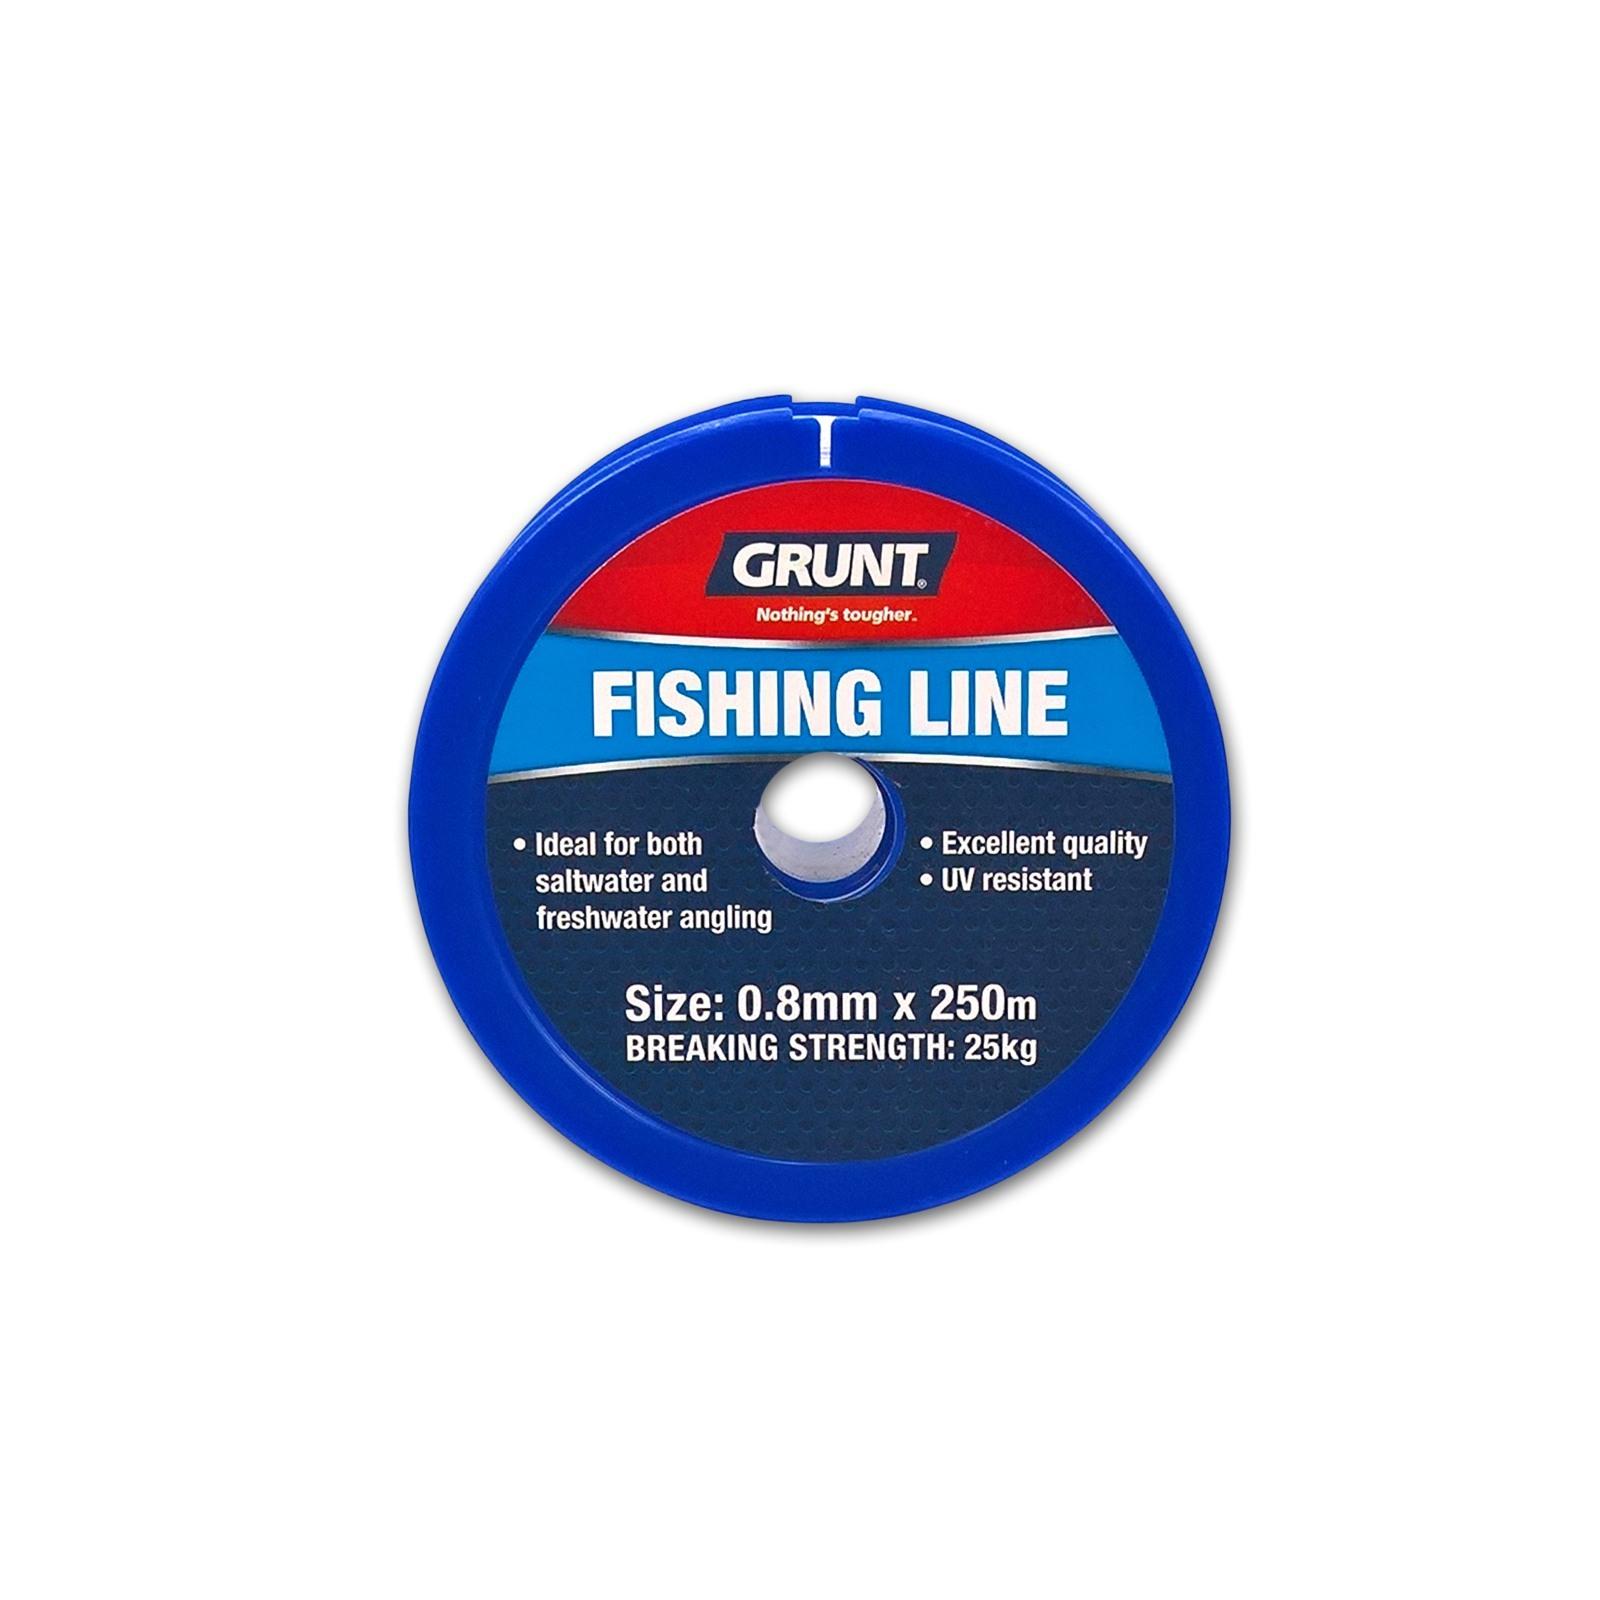 Grunt 0.80mm x 250m Fishing Line